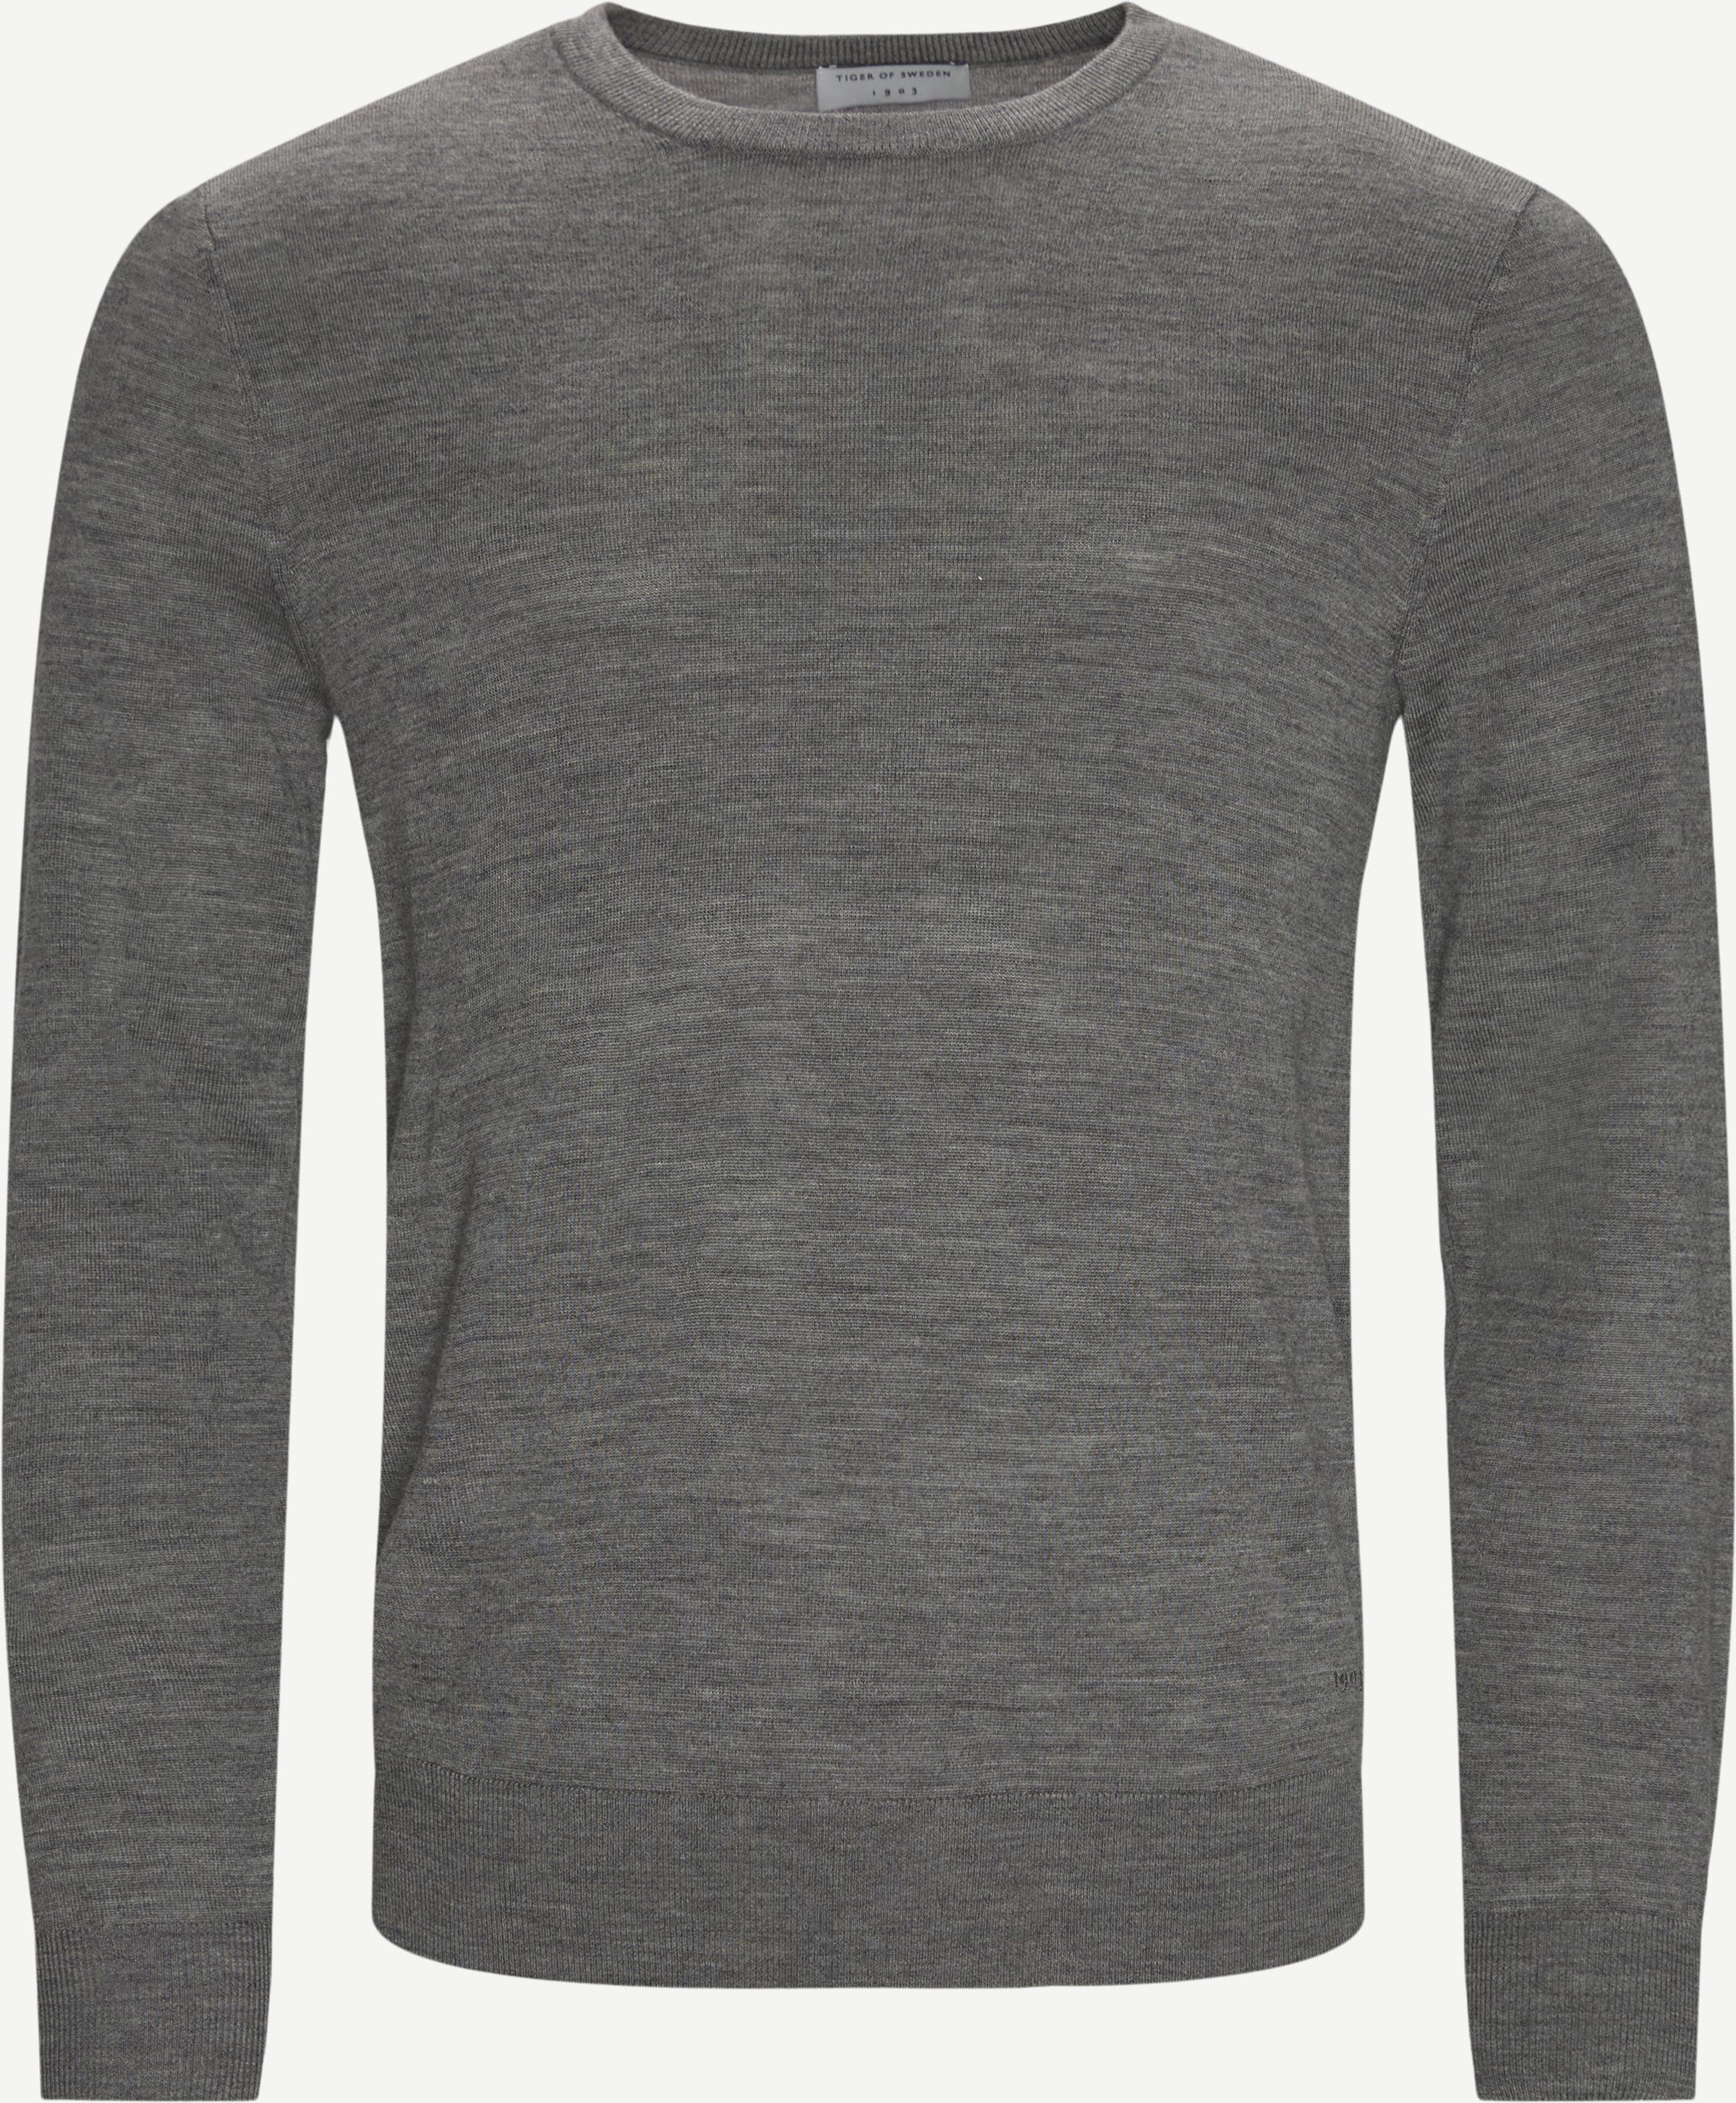 Strickwaren - Regular fit - Grau